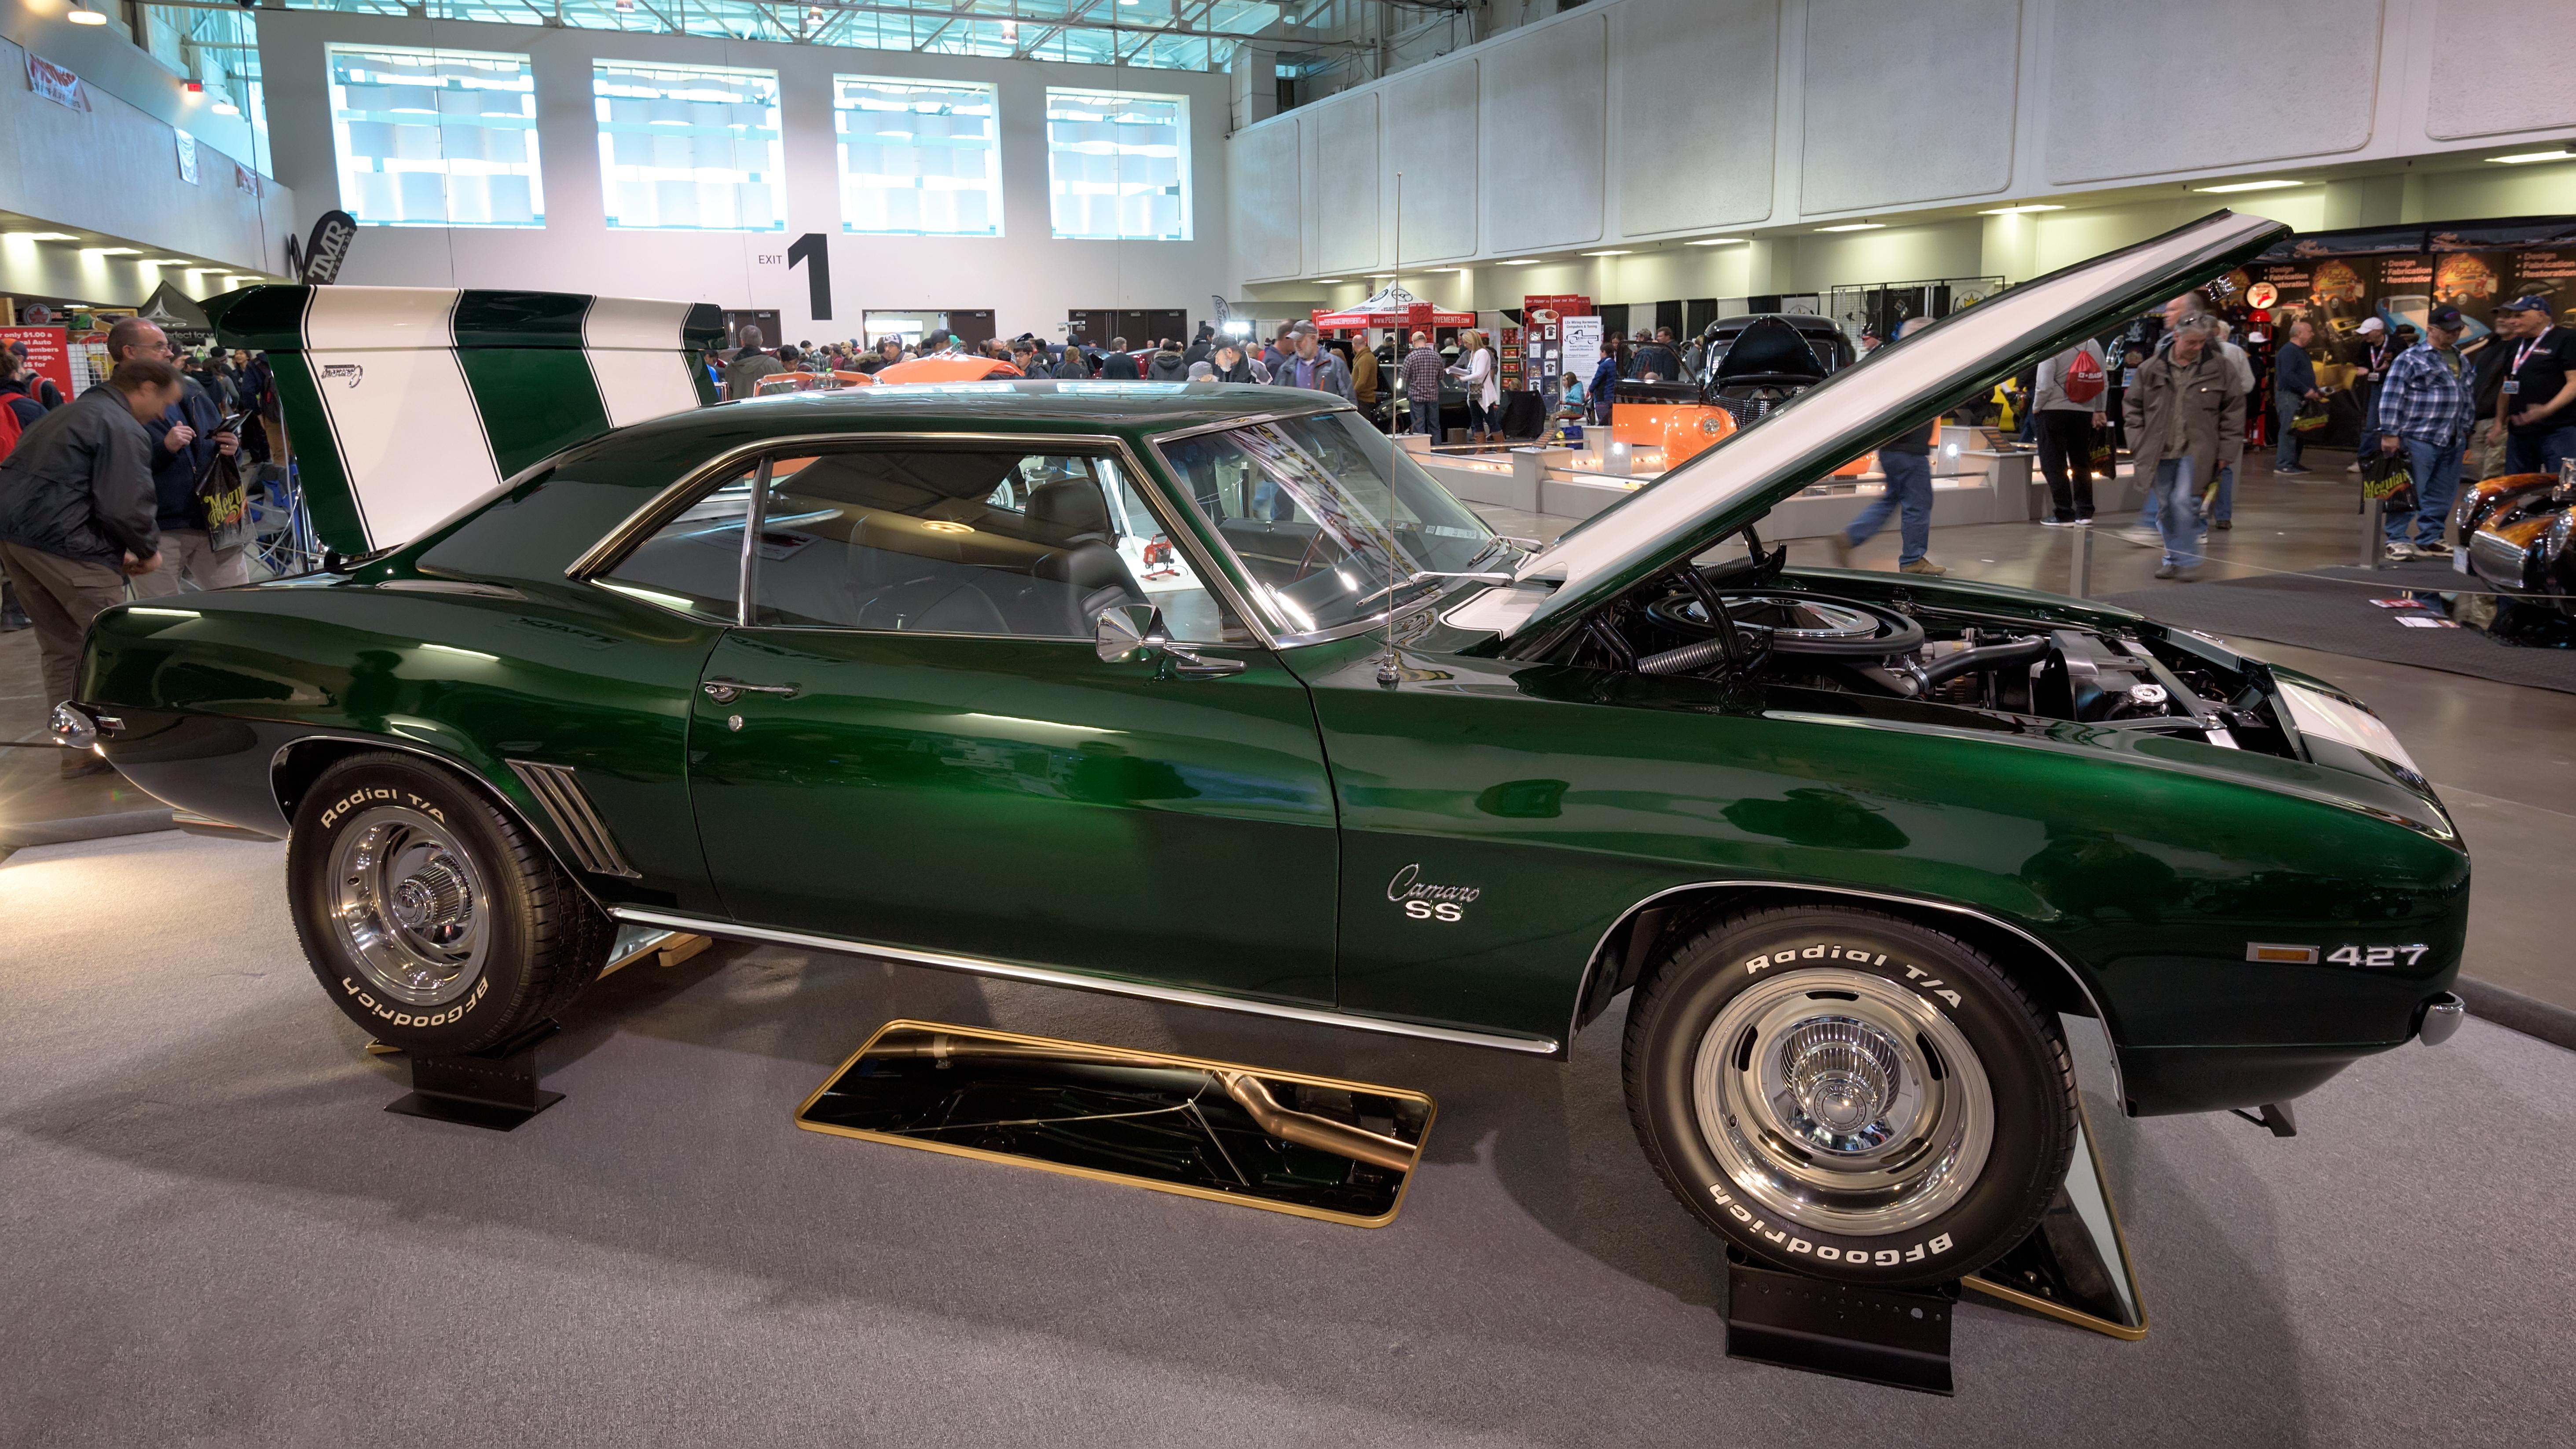 1969 chevrolet camaro ss 427 photo